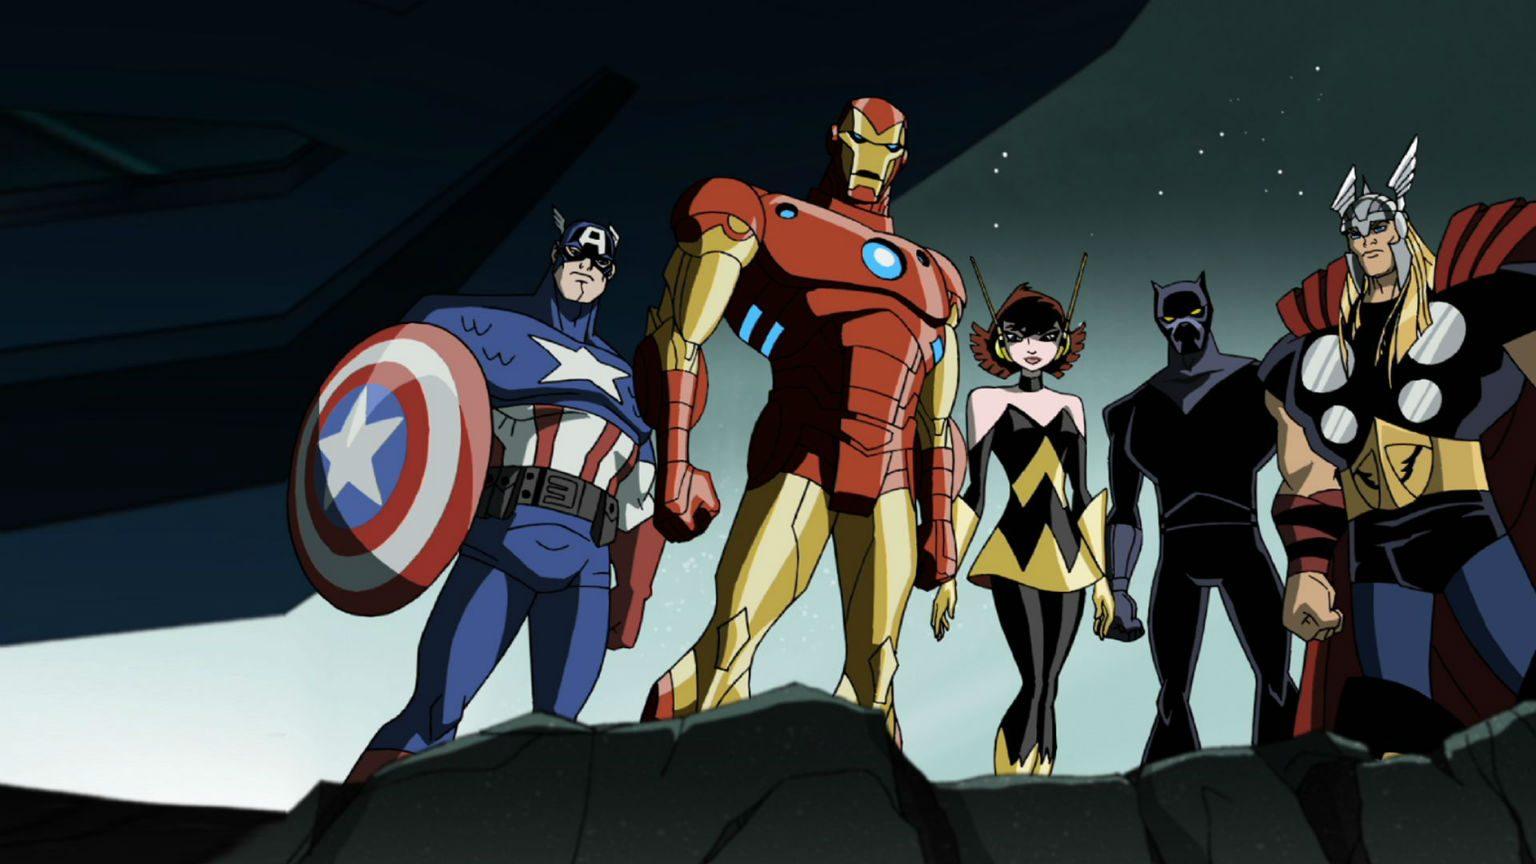 Best Disney+ action shows - Avengers cartoon